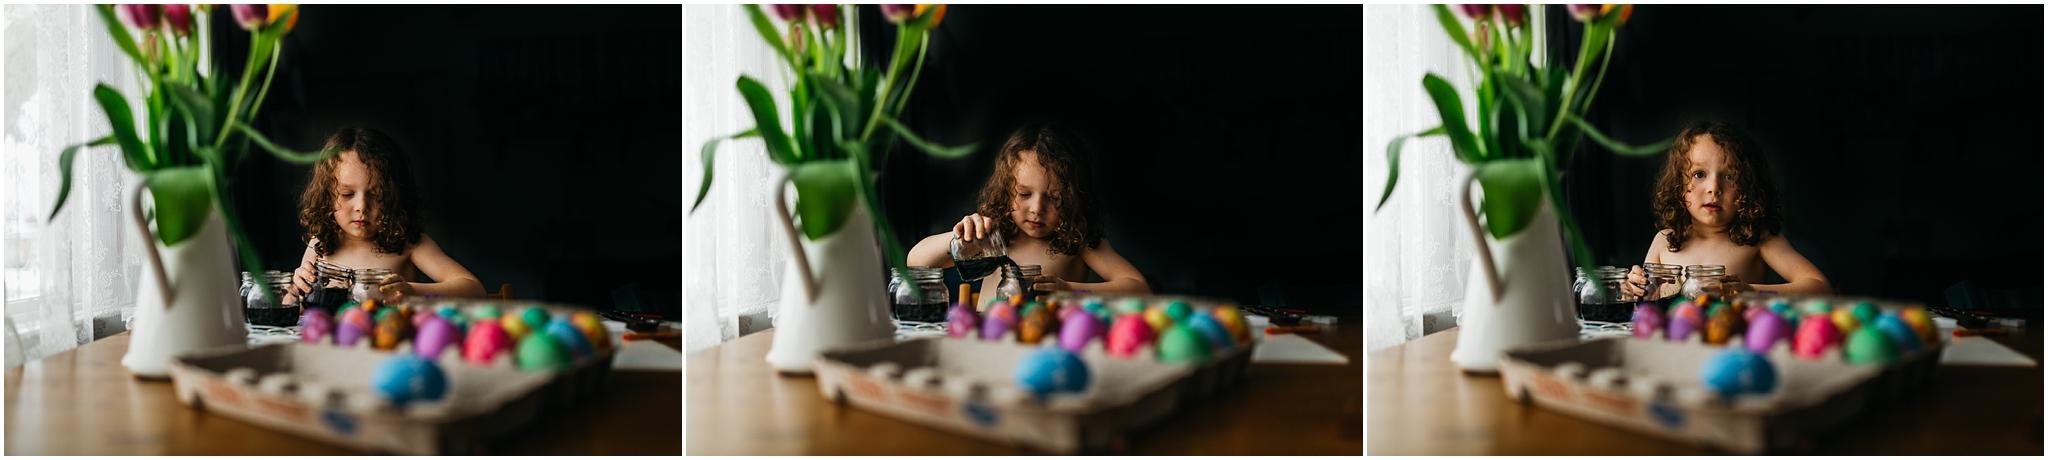 Easter Egg Painting - Edmonton Photographer - Edmonton Family Photographer -  Easter Eggs - Easter 2018 - Crayons on Easter Eggs - Edmonton Documentary Photographer - Family Photography - Documentary Photography - Edmonton Documentary Photographer - Edmonton Lifestyle Photography